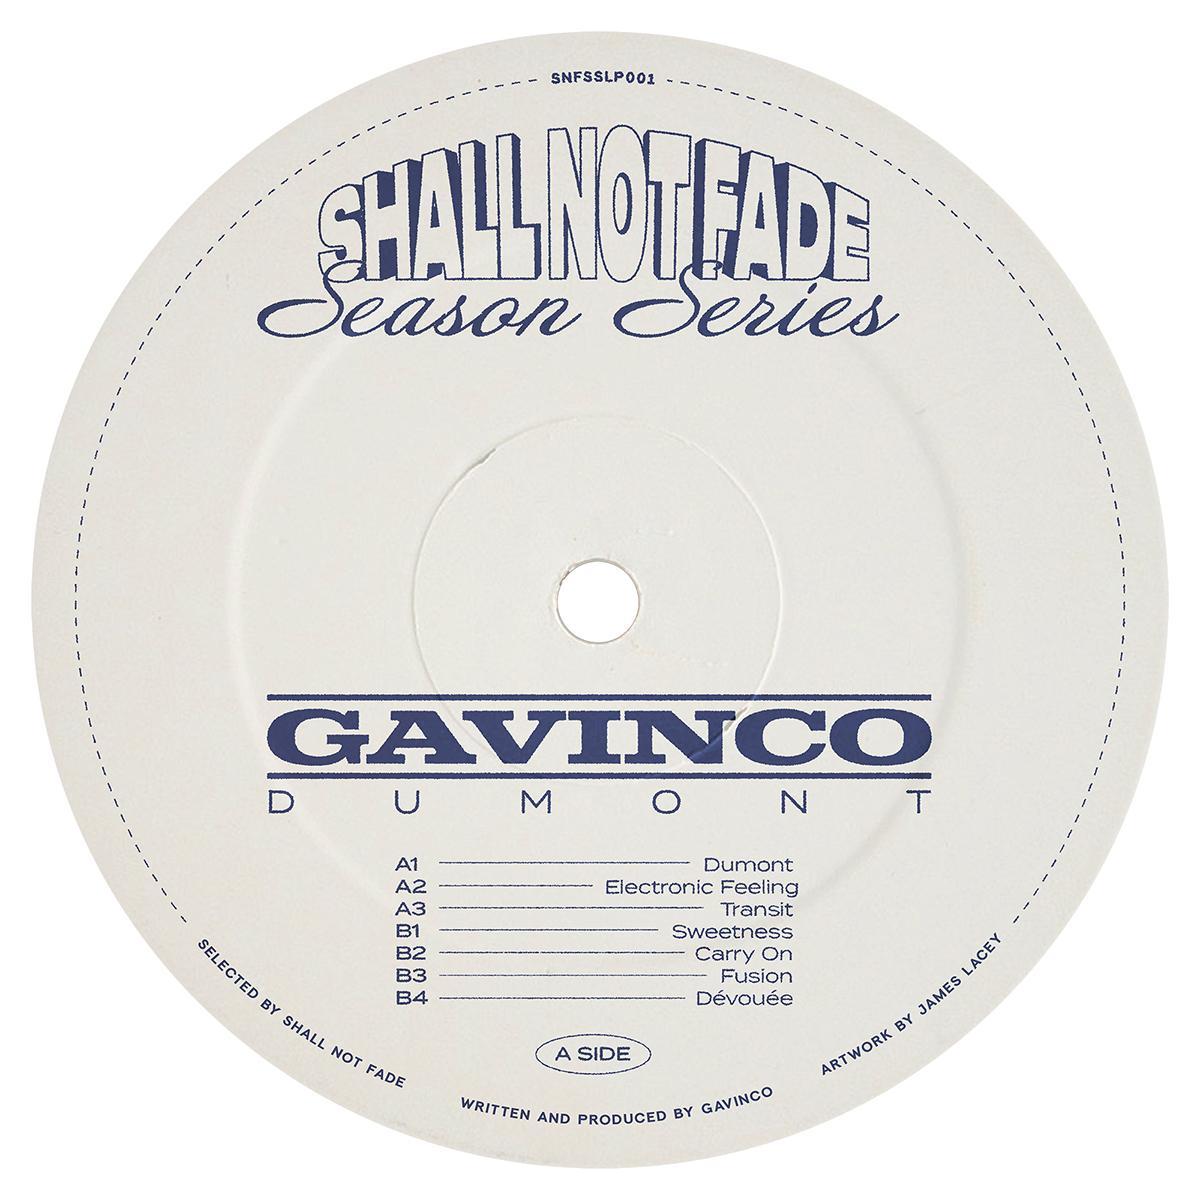 Gavinco/DUMONT LP